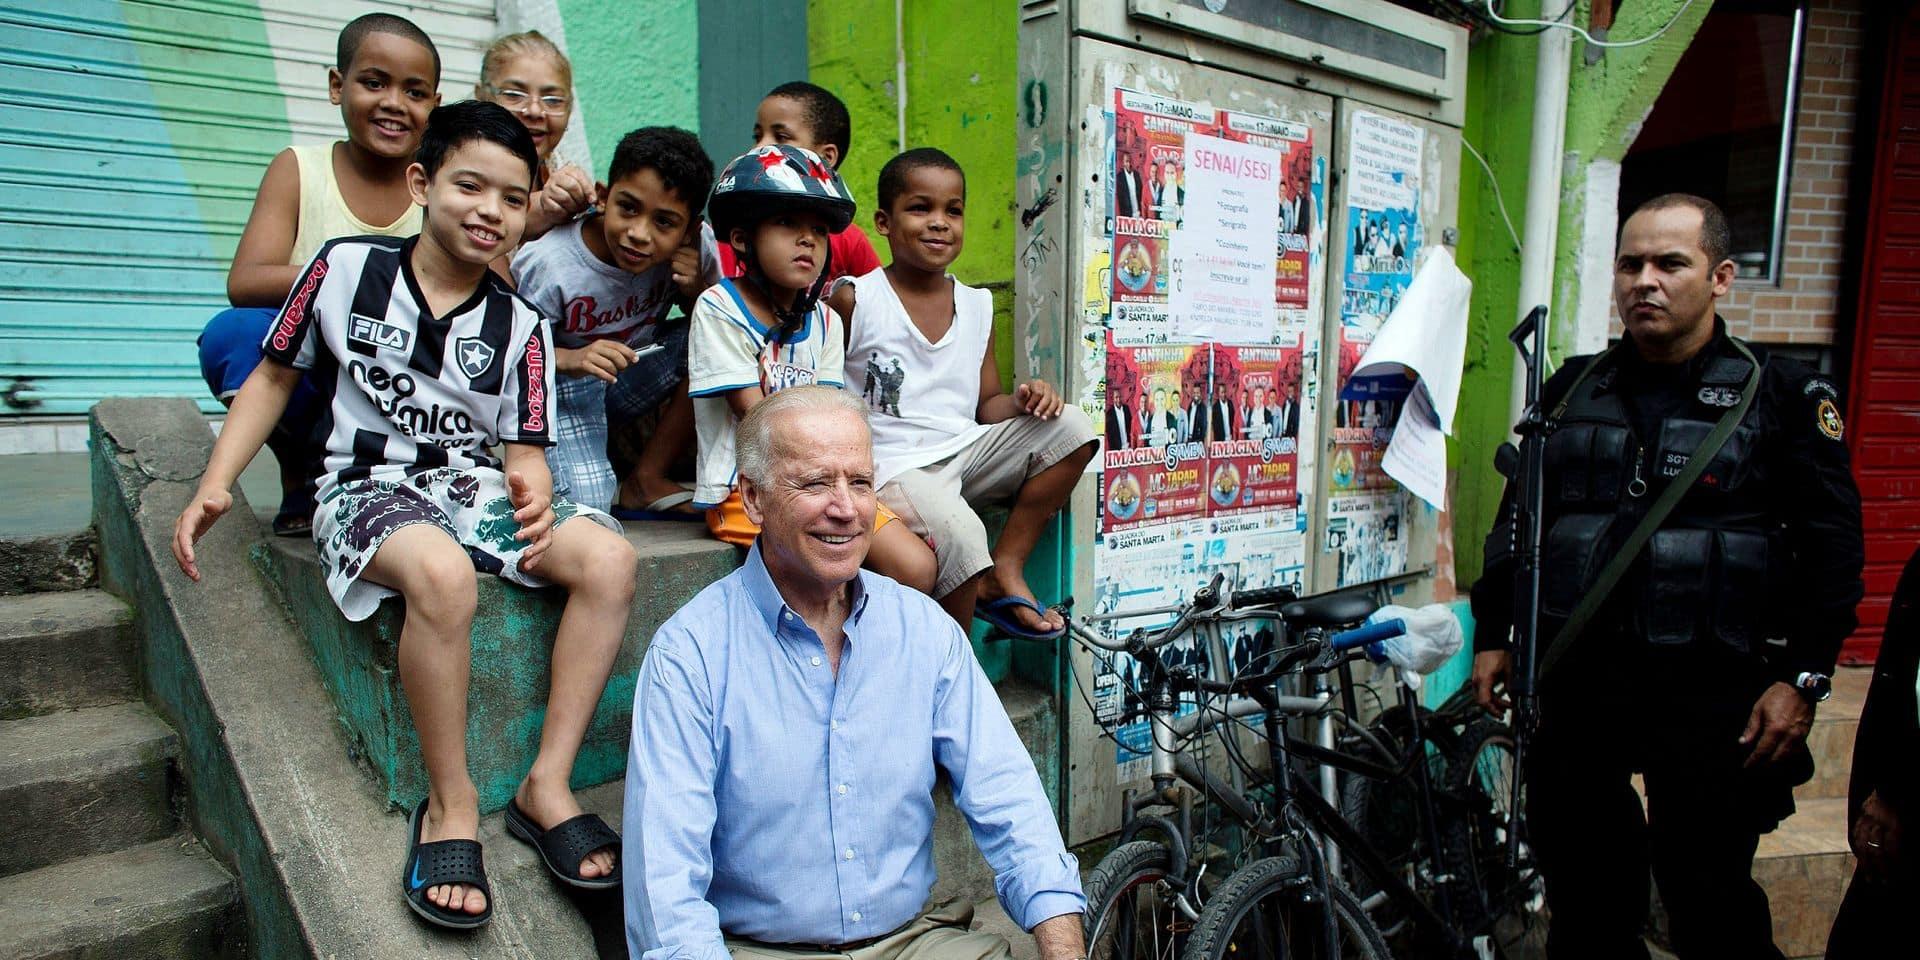 Amérique latine: après les insultes de Donald Trump, l'amitié de Joe Biden